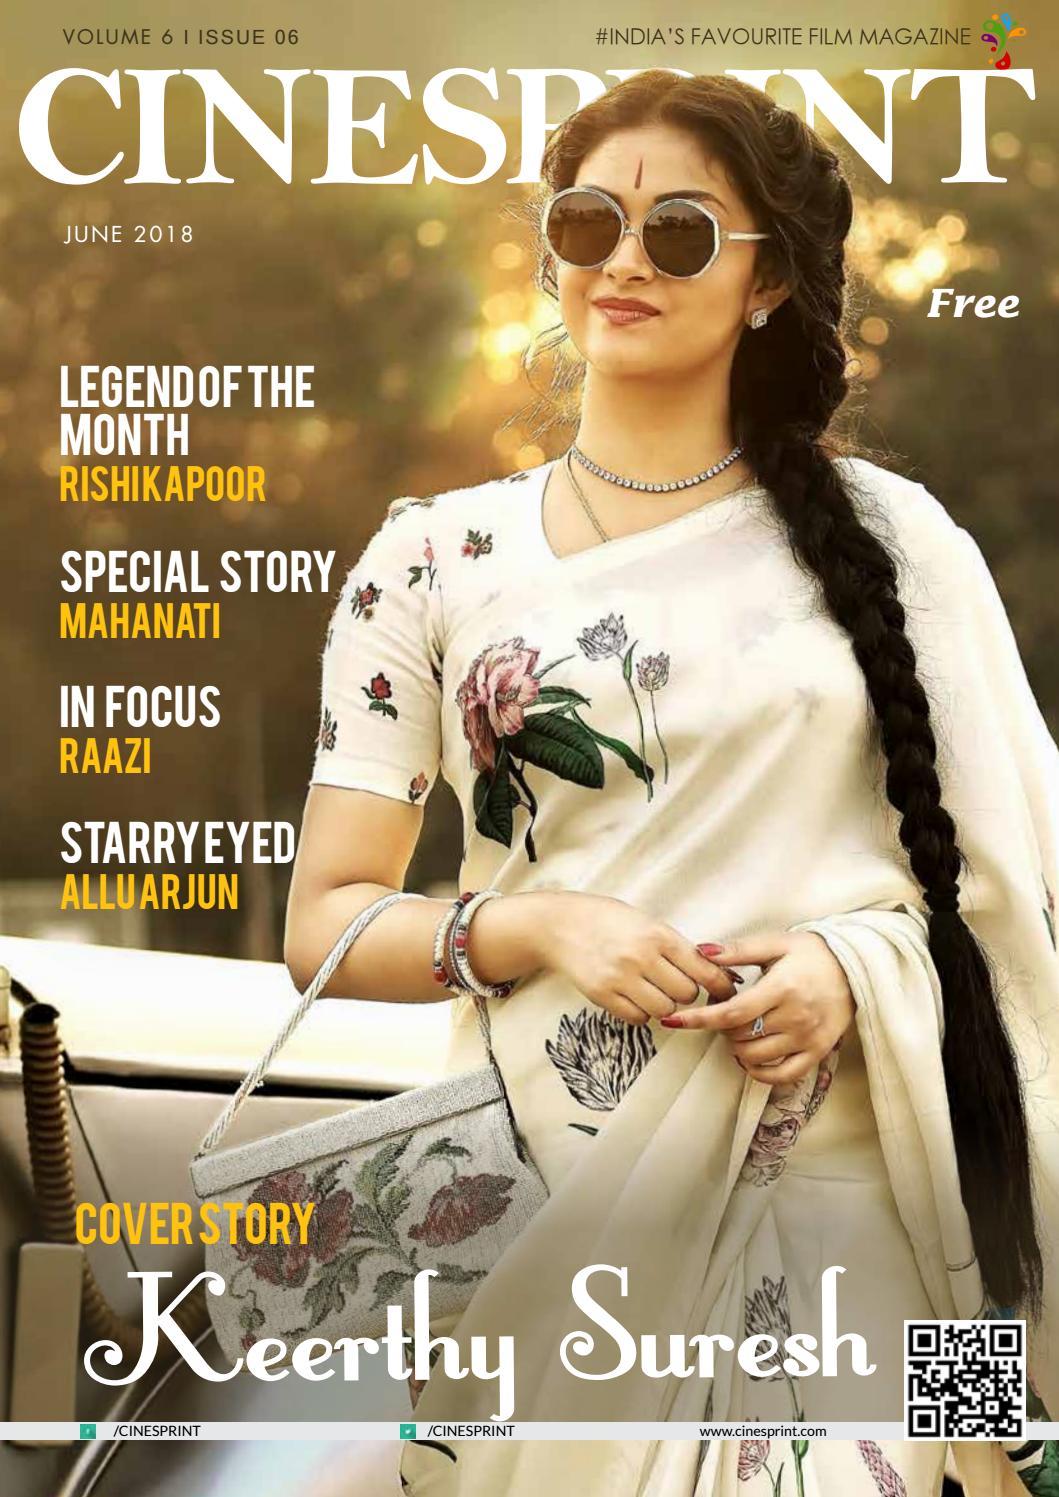 Cinesprint Magazine June 2018 by Wishesh Digital Media Pvt Ltd - issuu